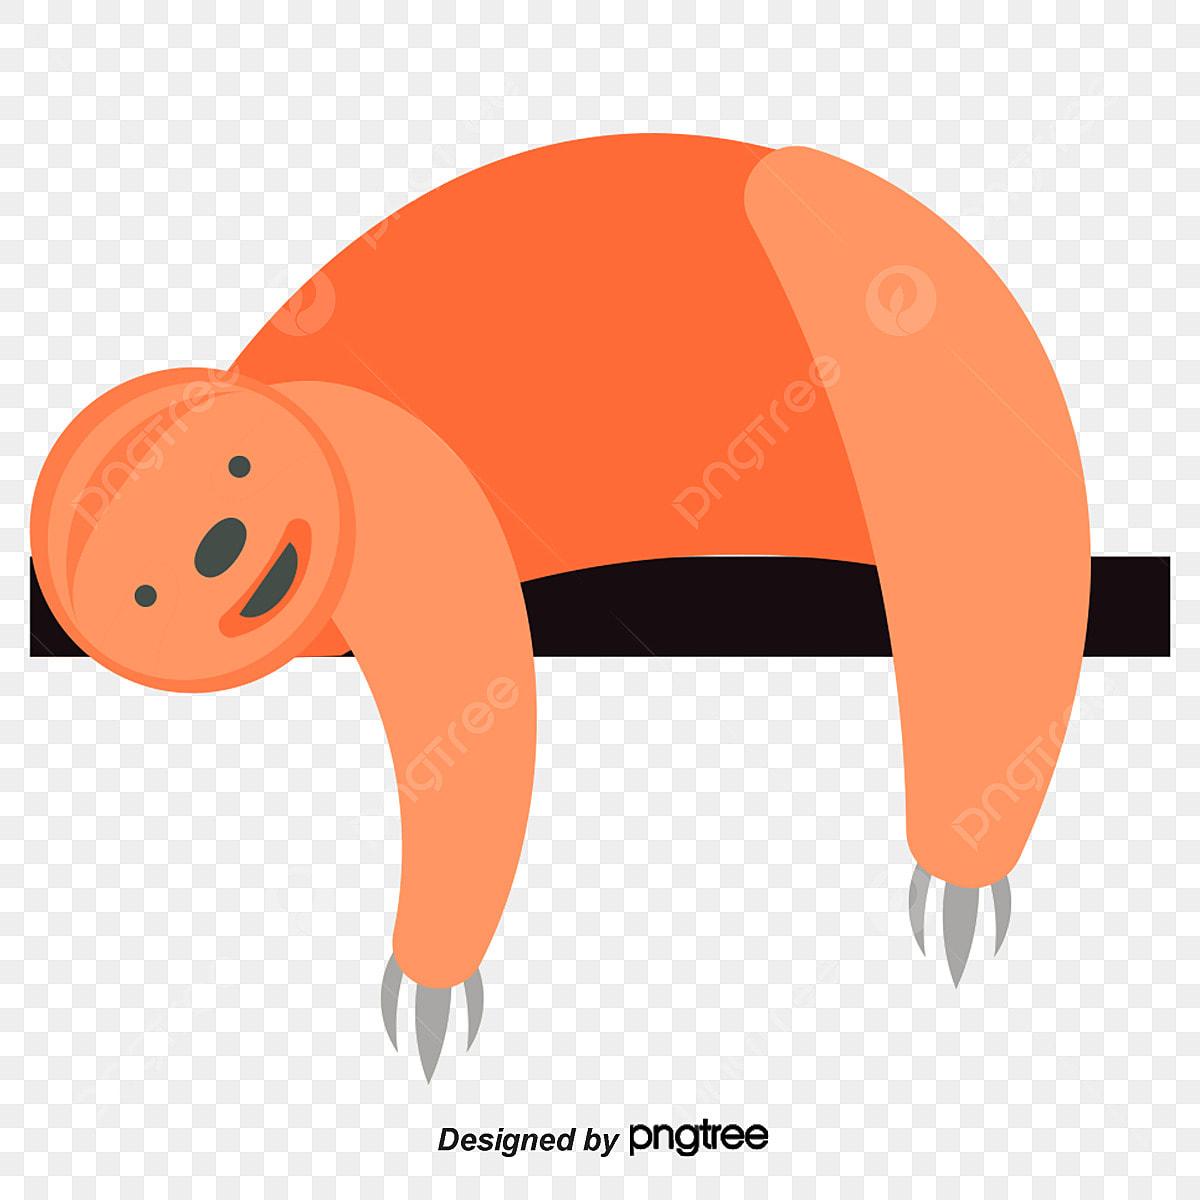 les animaux de la mode dessin anim u00e9 paresseux le paresseux de la mode dessin anim u00e9 mobile